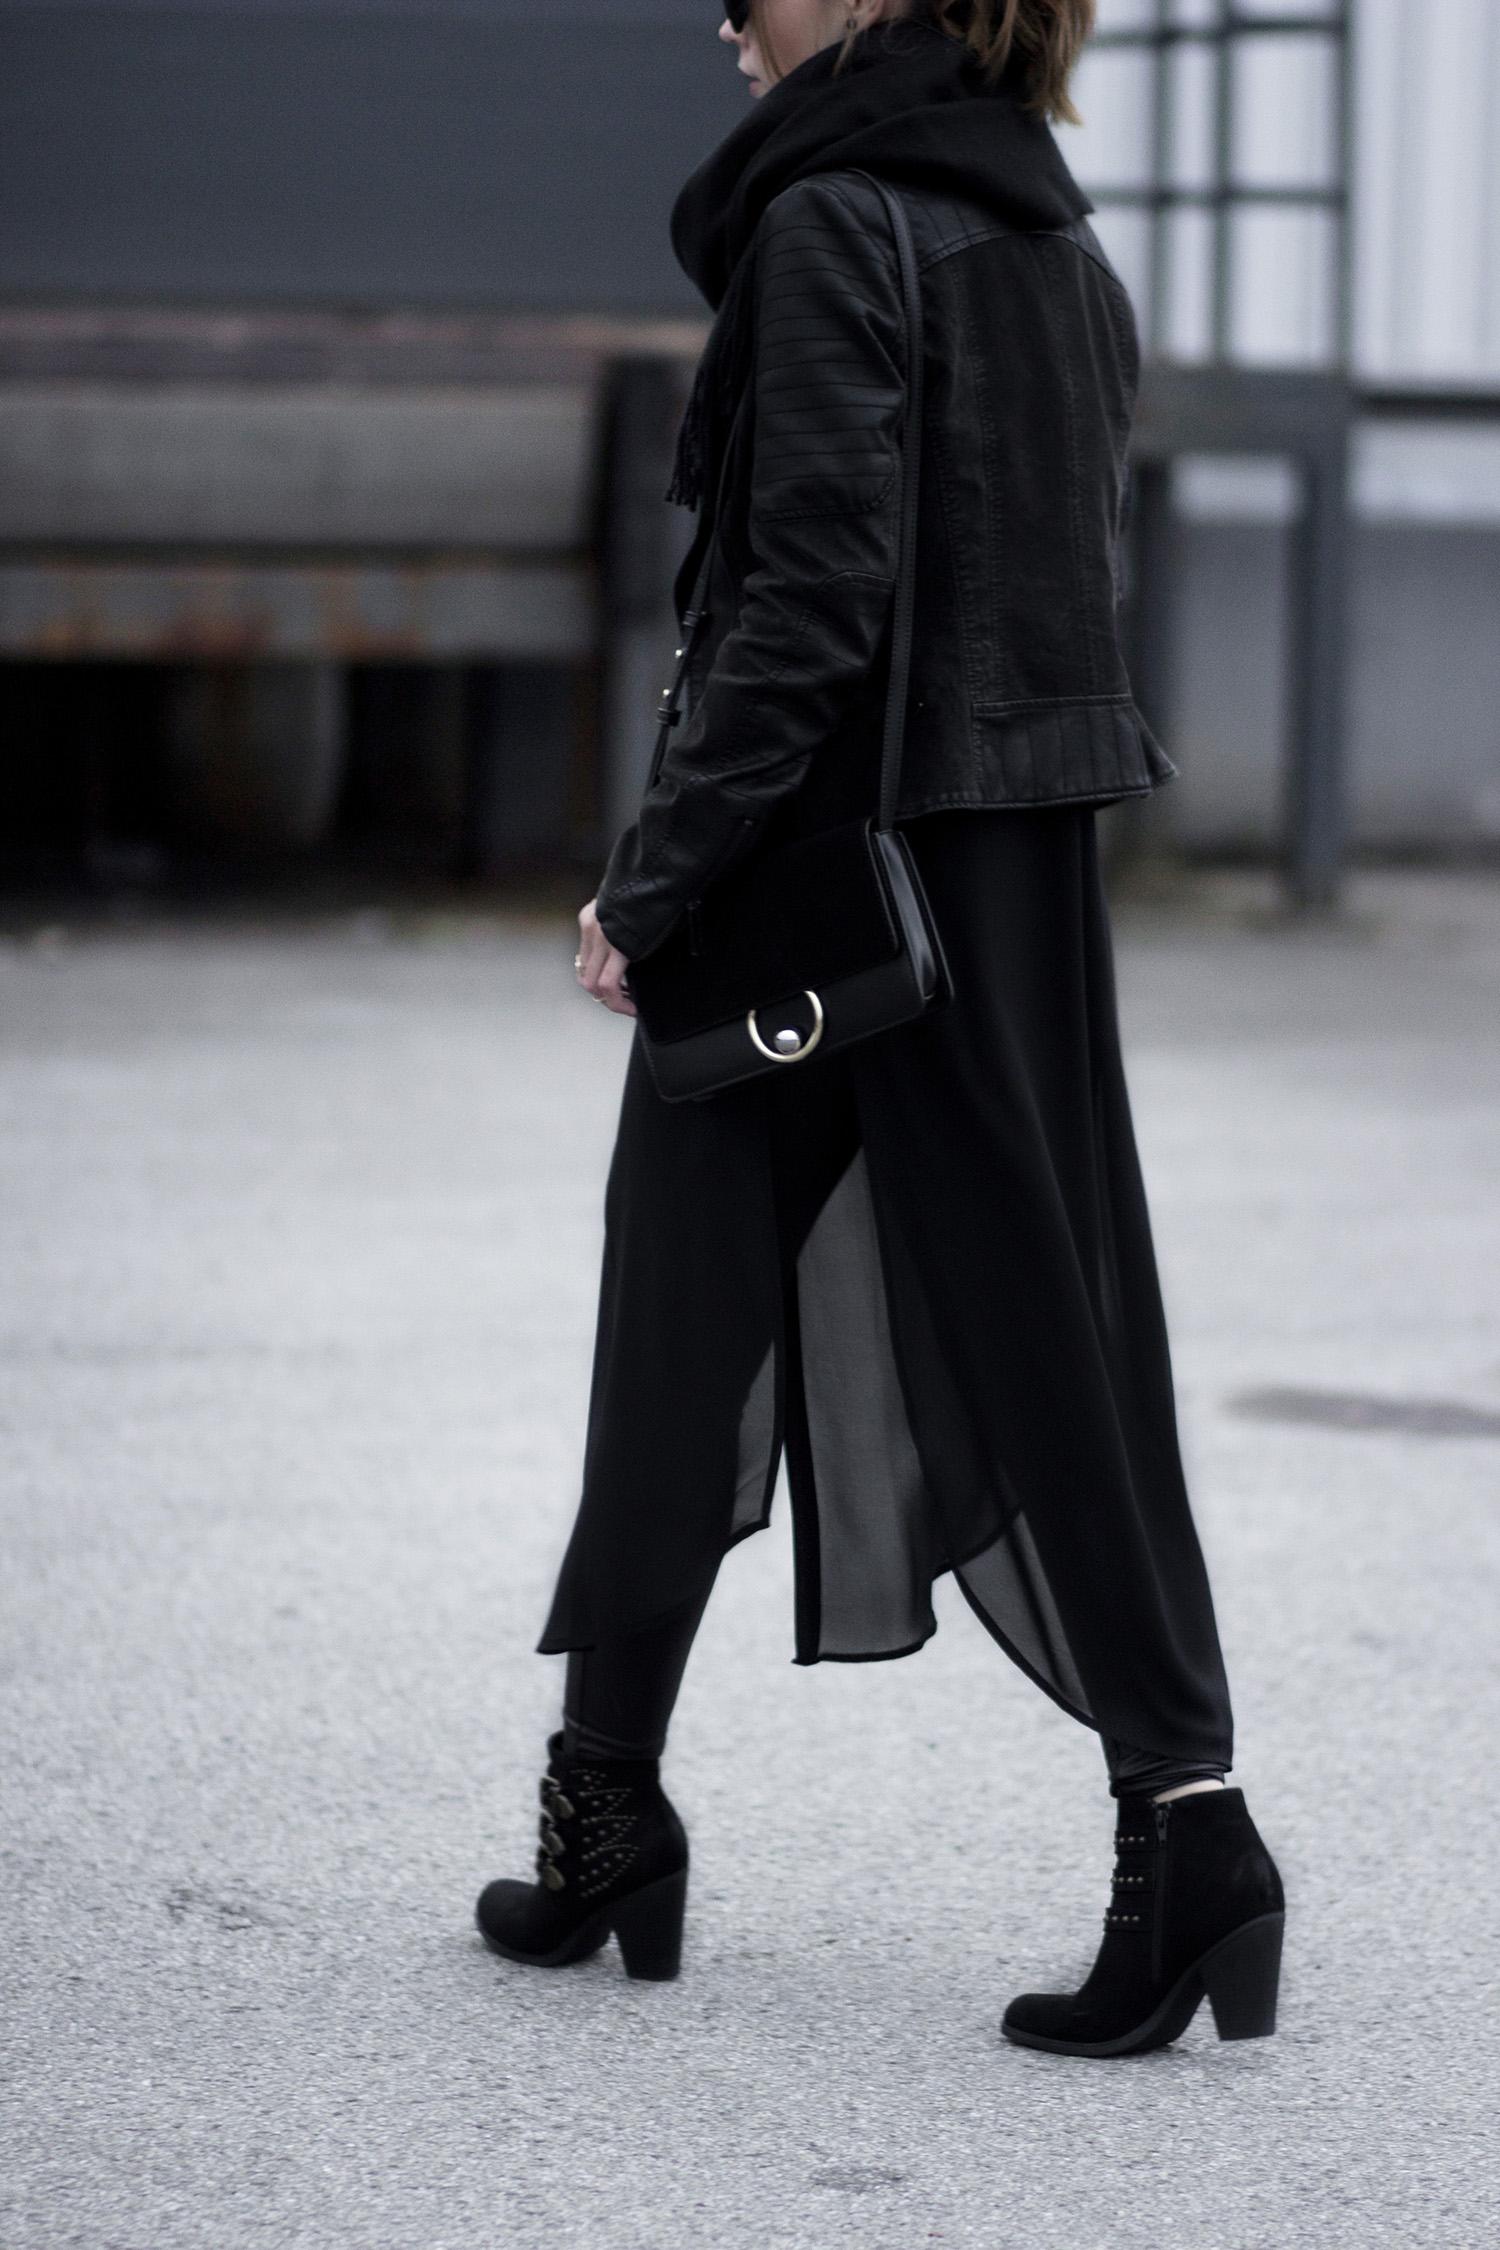 All Black Outfit, schwarz kombinieren, lange Bluse, Lederleggings, Lederjacke, Herbstoutfit, Streetstyle, bezauberndenana.de